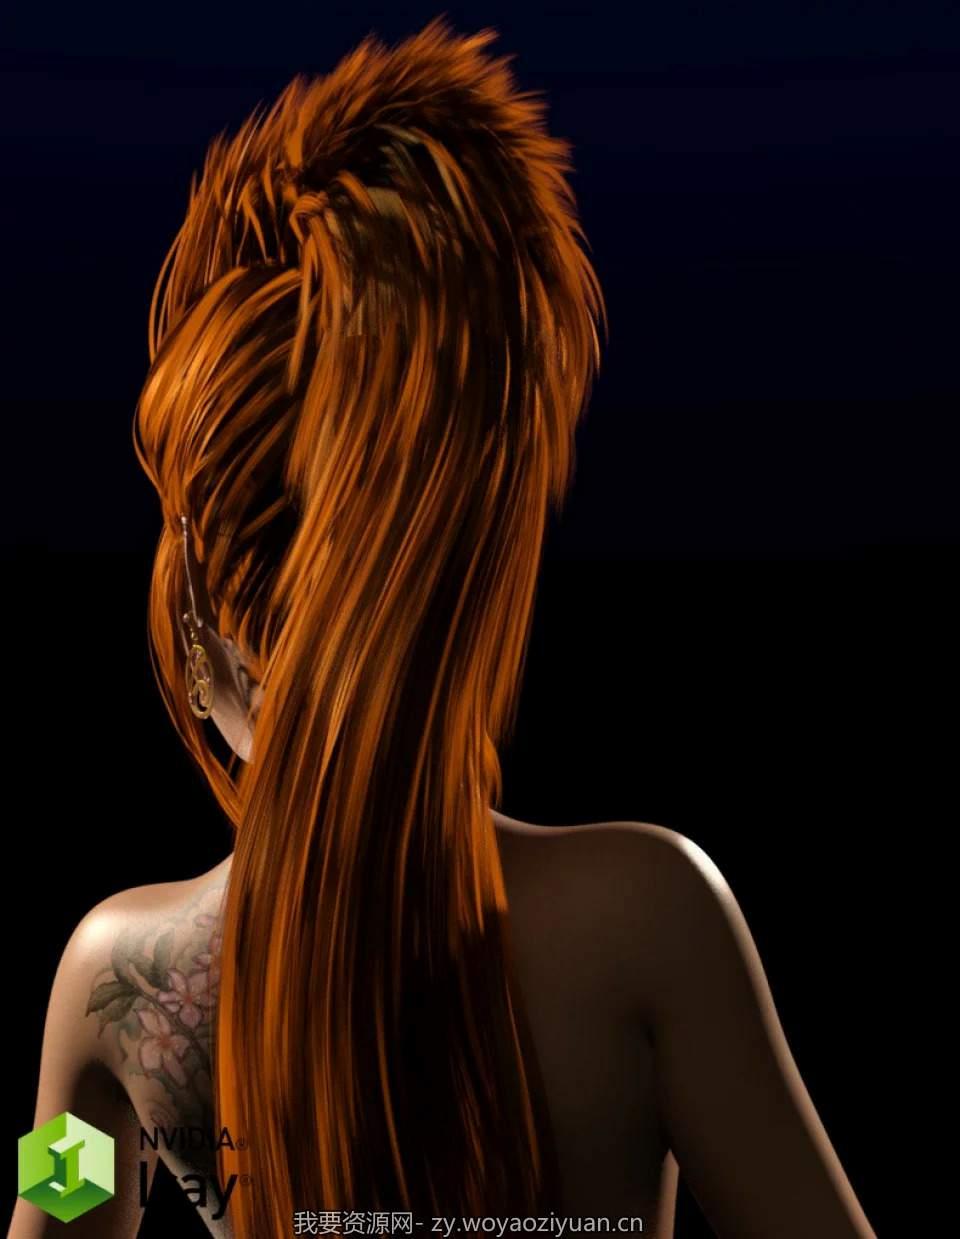 Iray 13 Shades of Brunette for DAZ Studio